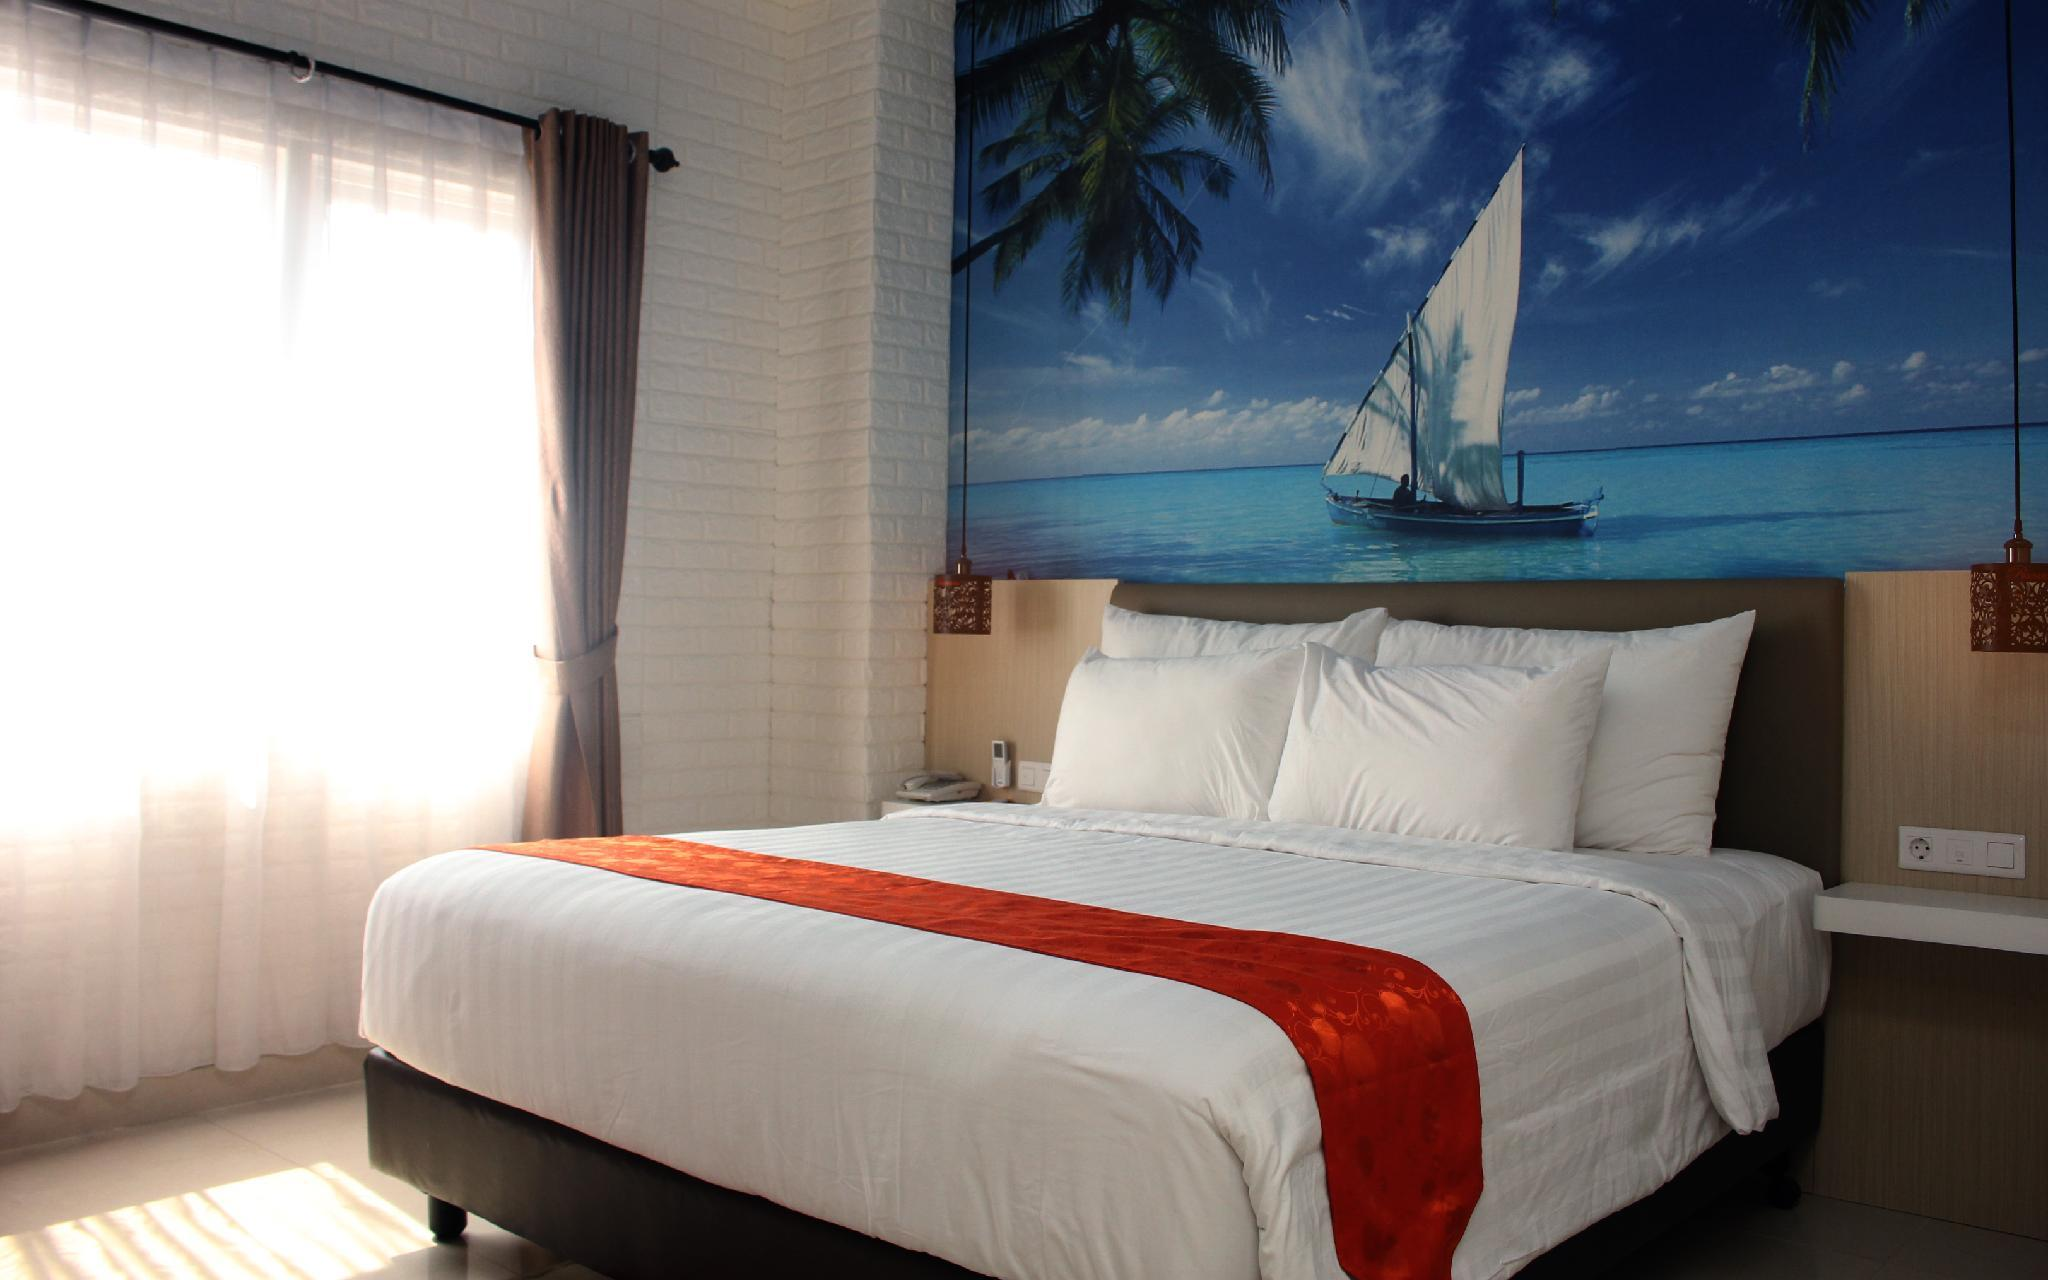 Premiere Hotel & Guest House, Tegal